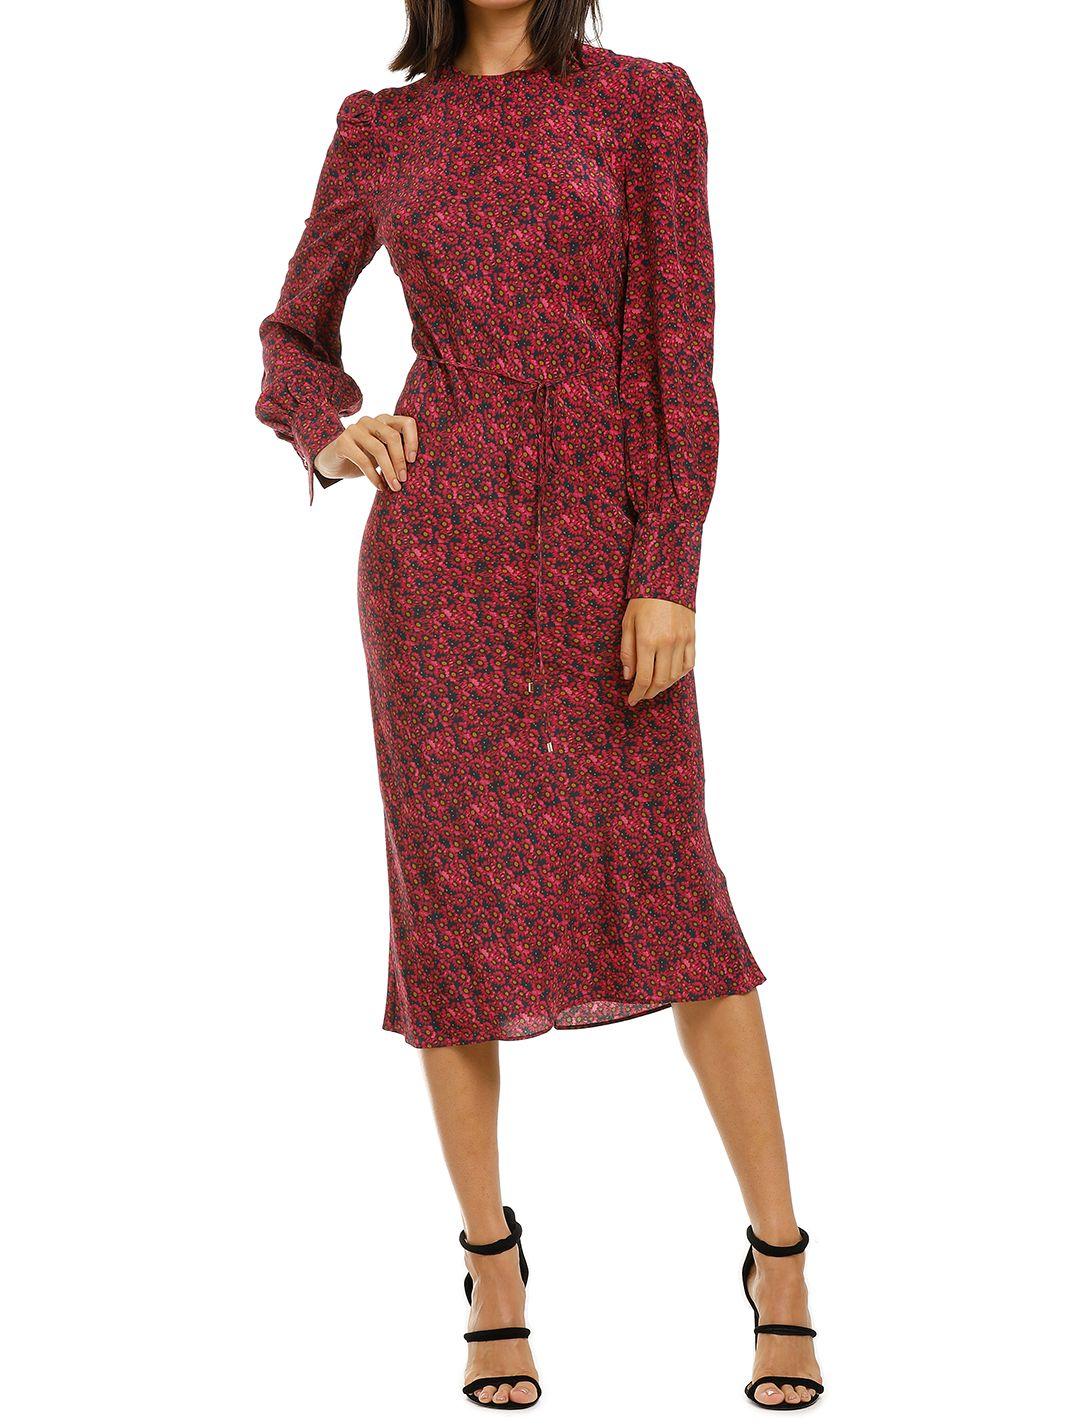 Rebecca-Vallance-Rosetter-LS-Midi-Dress-Berry-Floral-Front